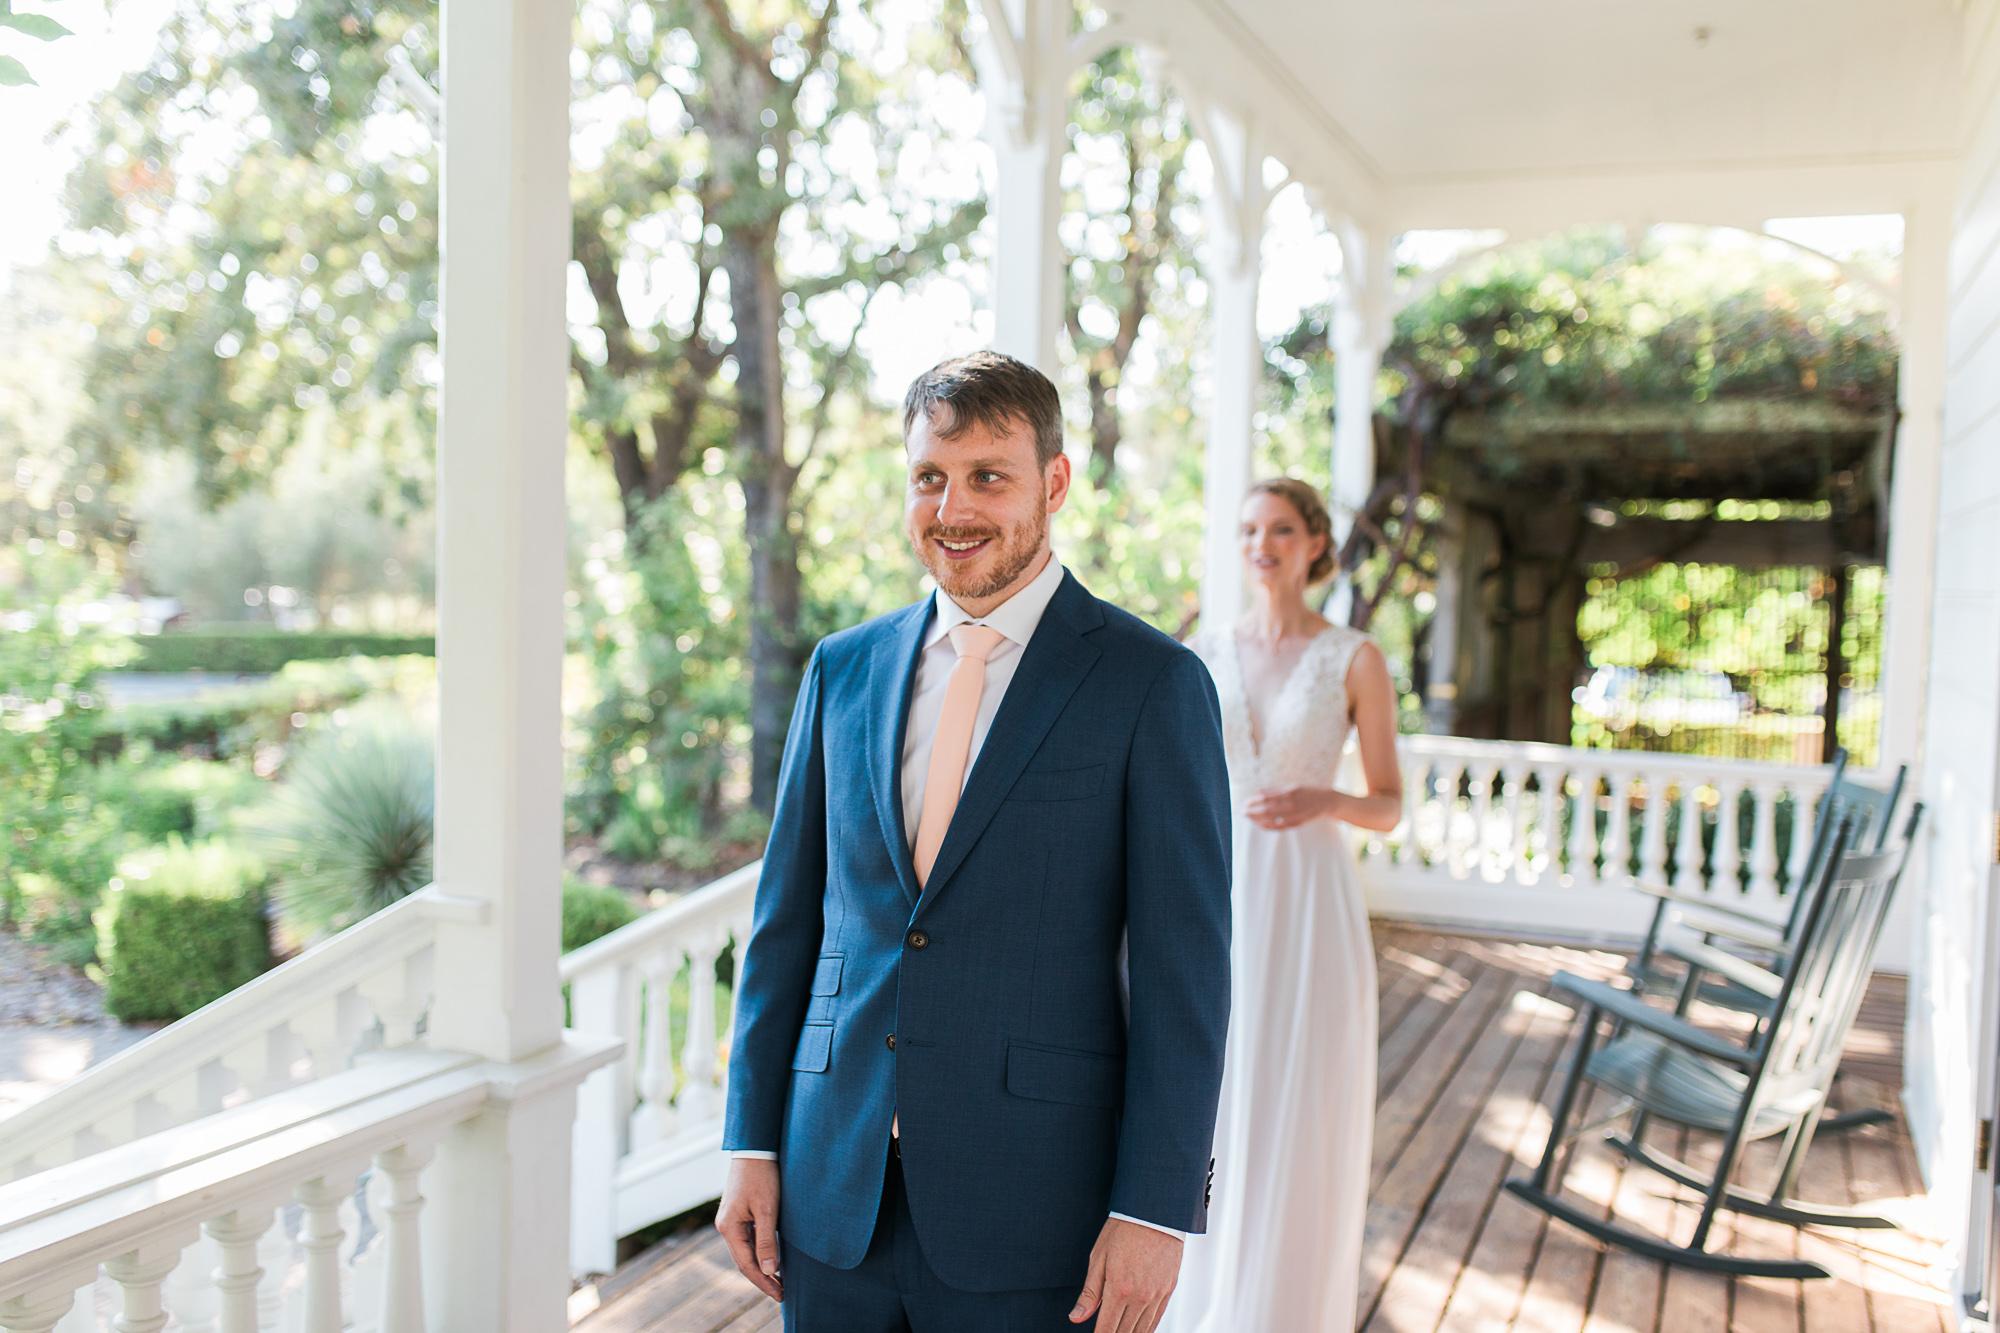 Generals Daughter Wedding Photos by JBJ Pictures - Ramekins Wedding Venue Photographer in Sonoma, Napa (4).jpg